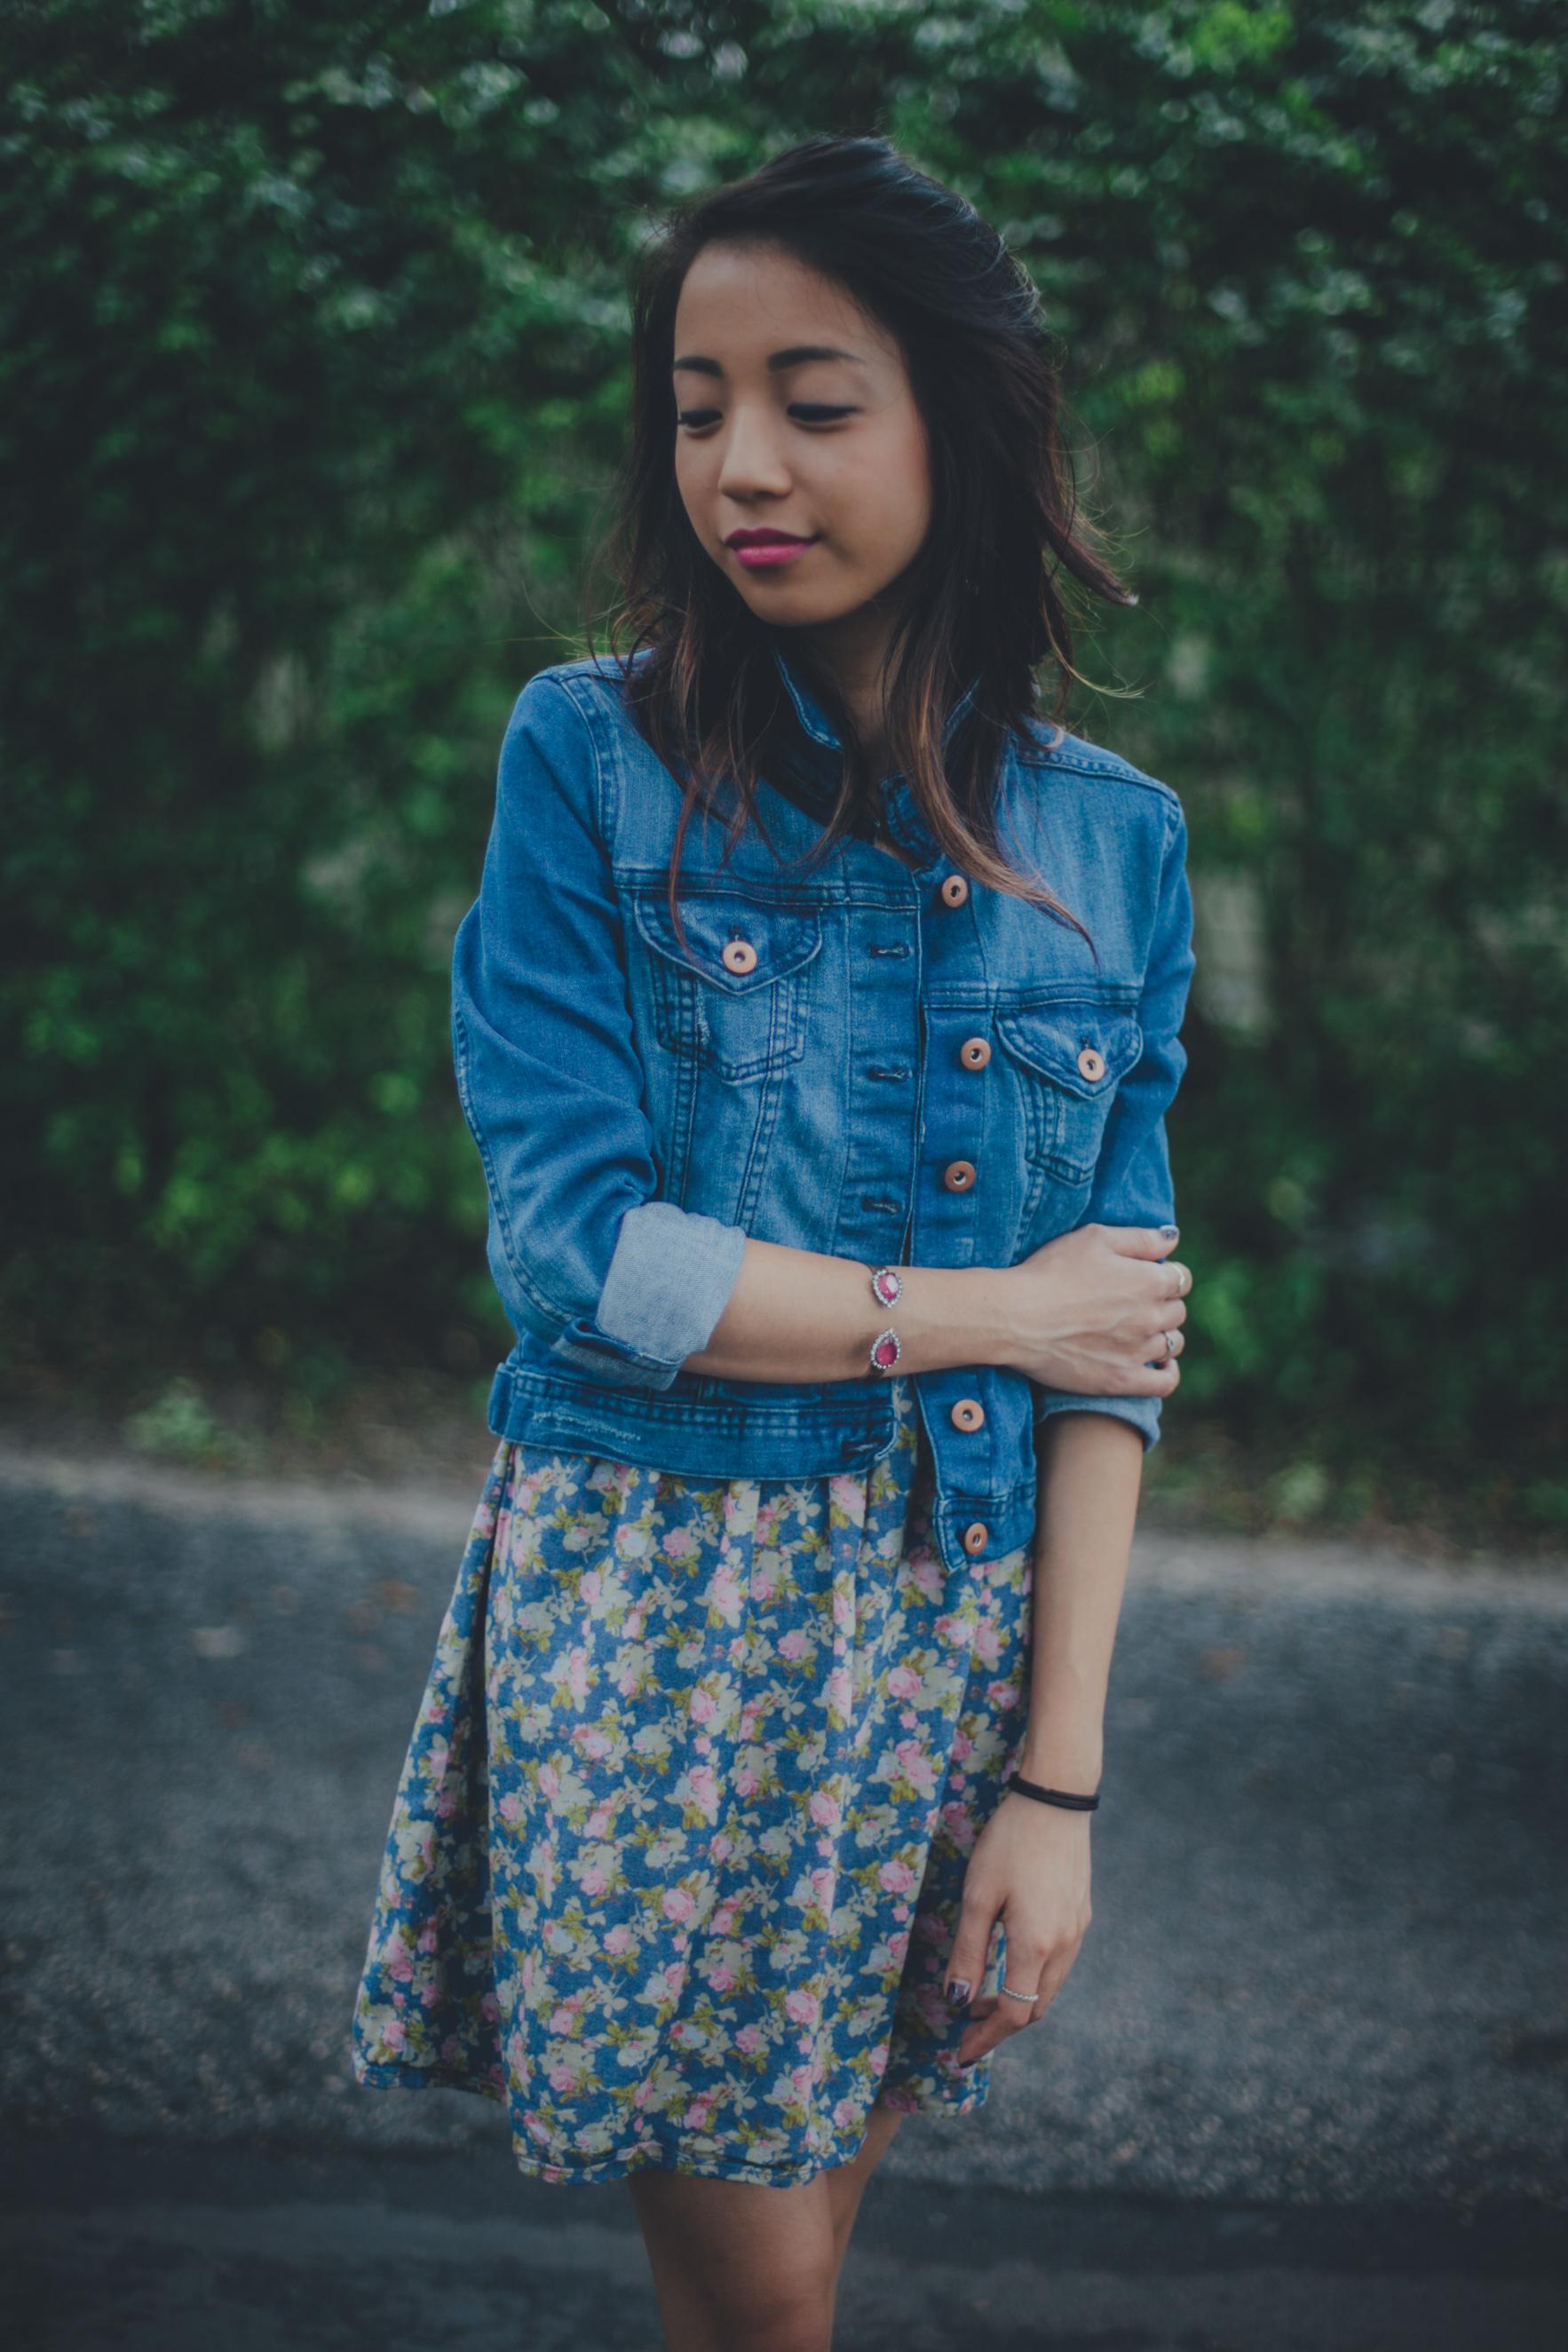 This Jenn Girl - Denim Jacket 5